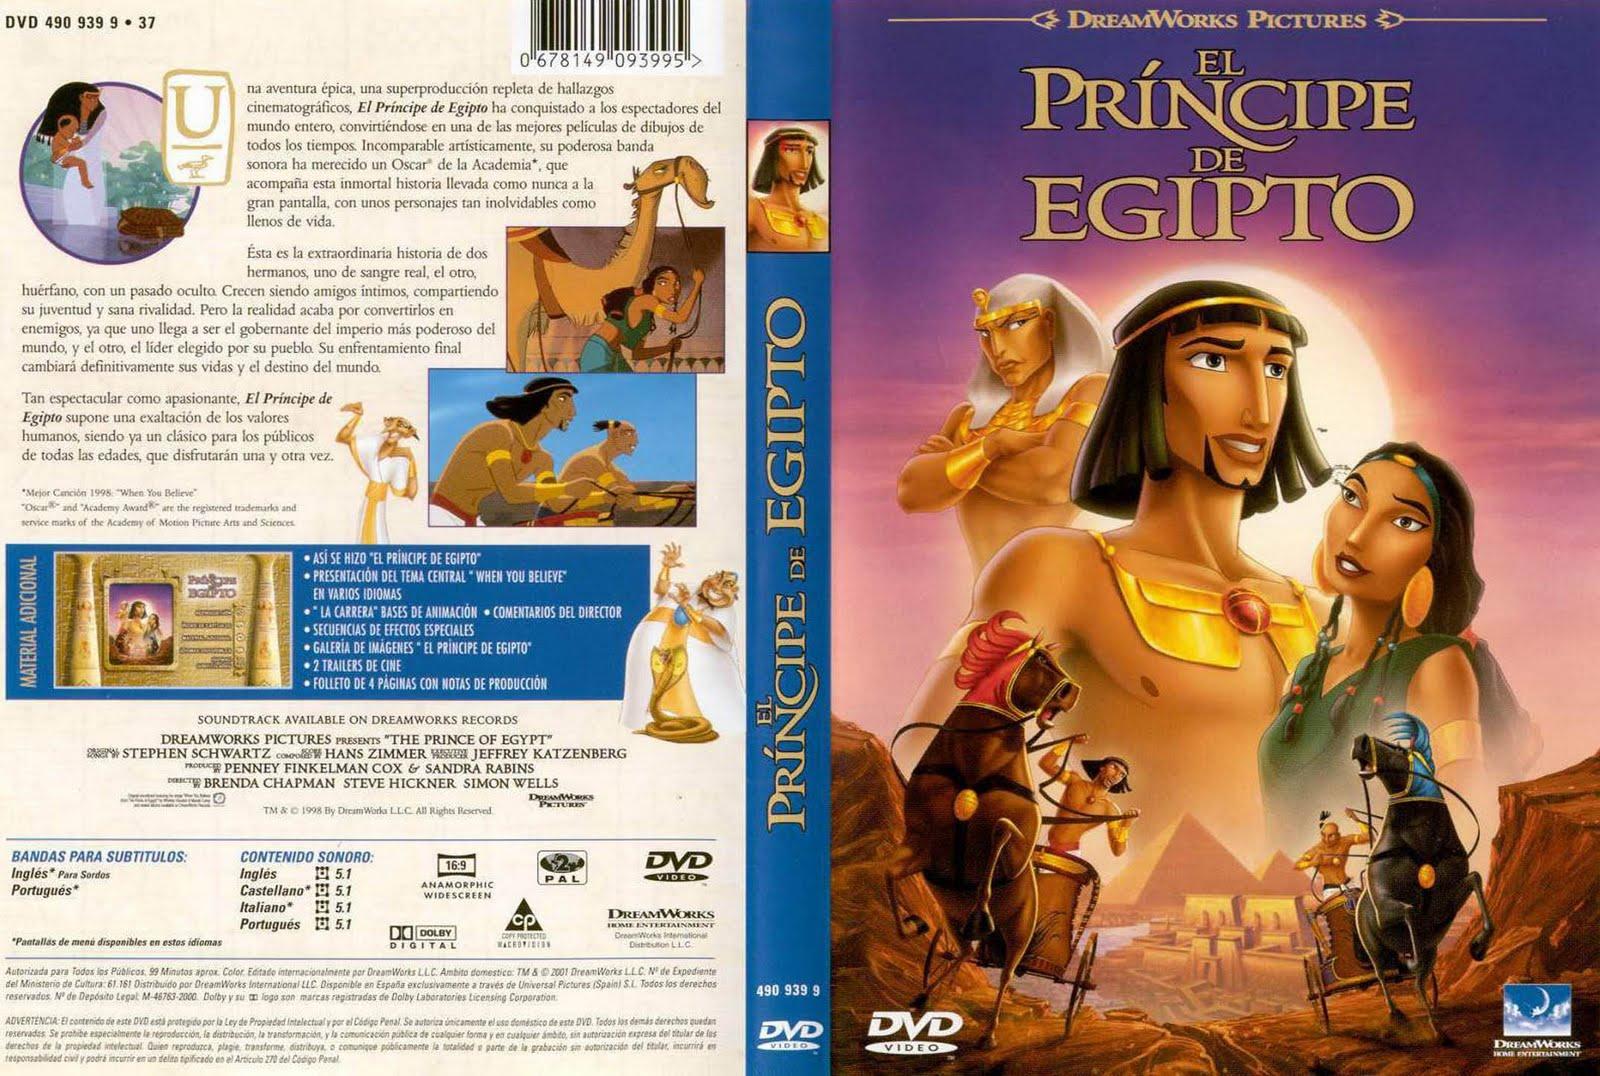 TIENDA DEL DVD